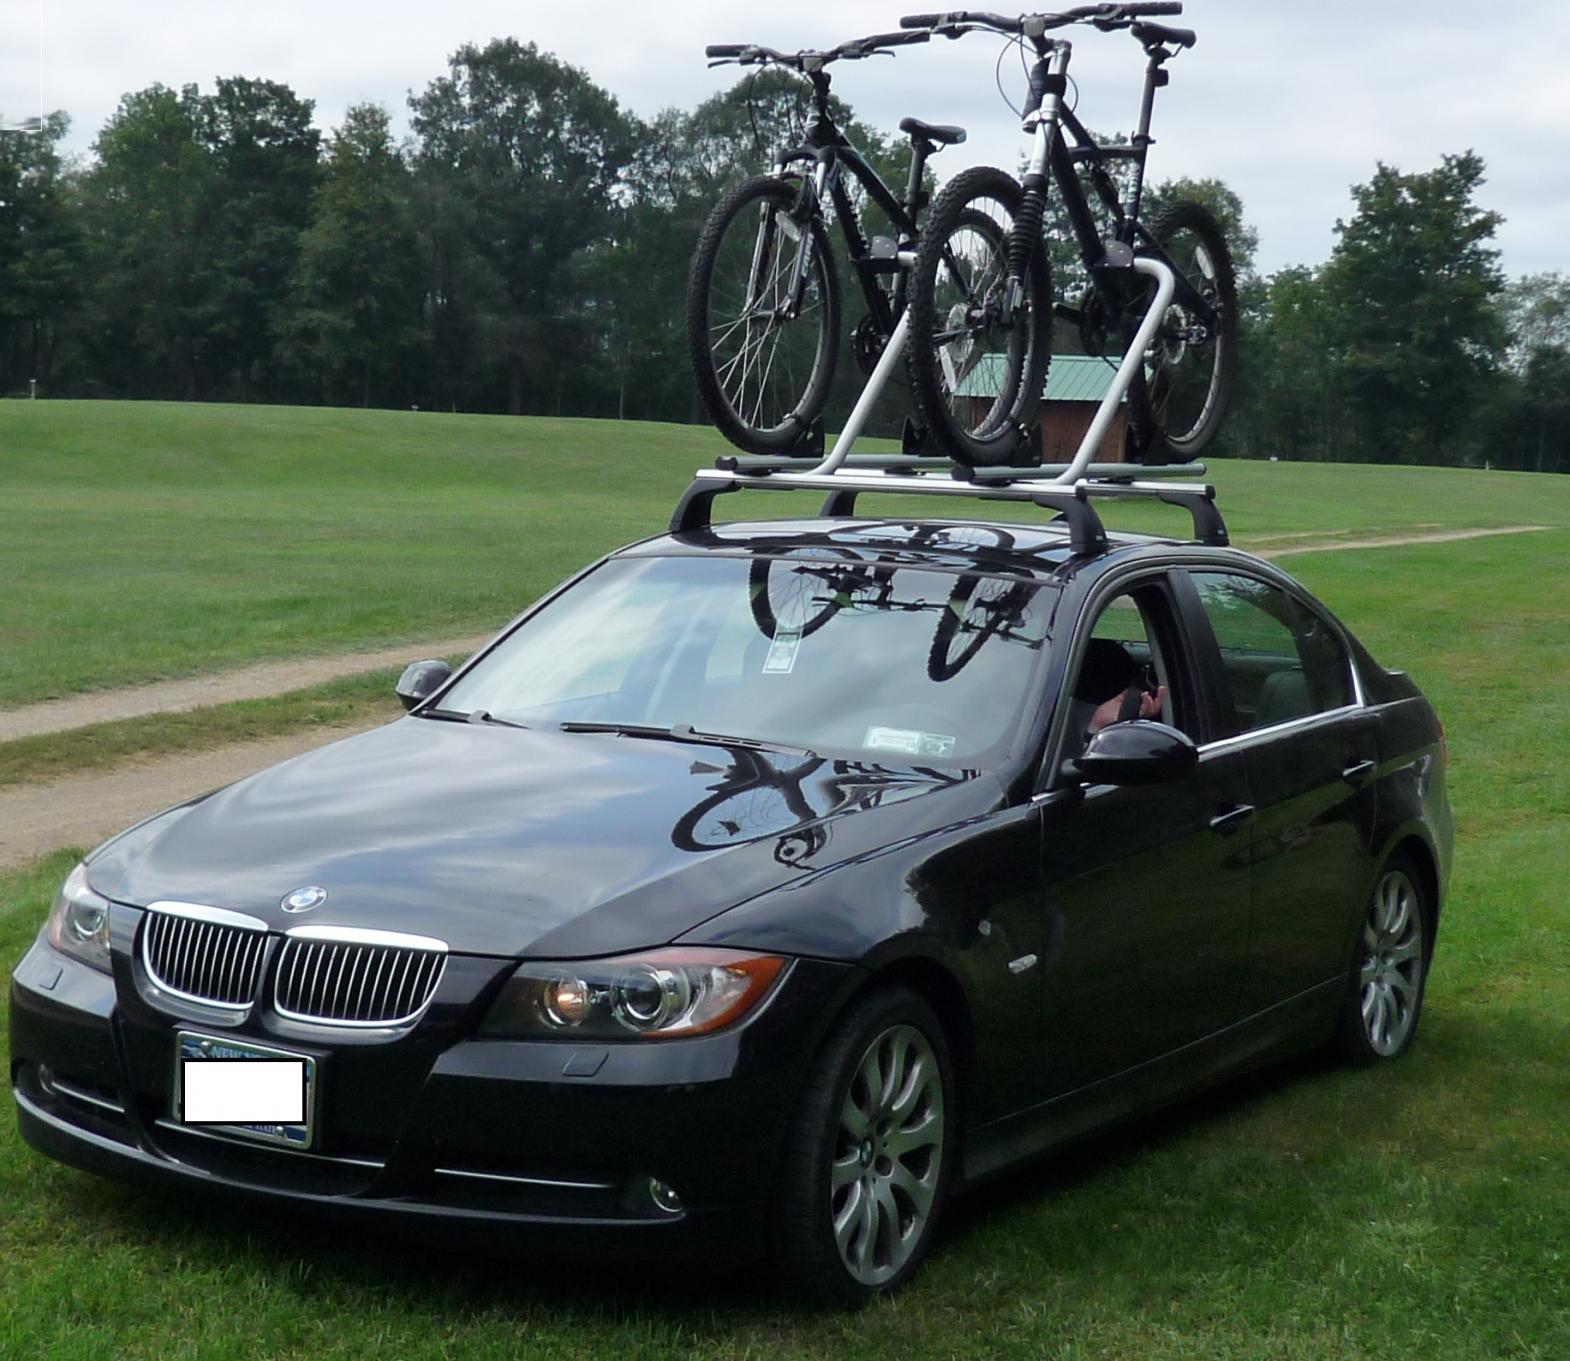 FS BMW Base System And Moutain Bike Racks - Bmw 335i bike rack